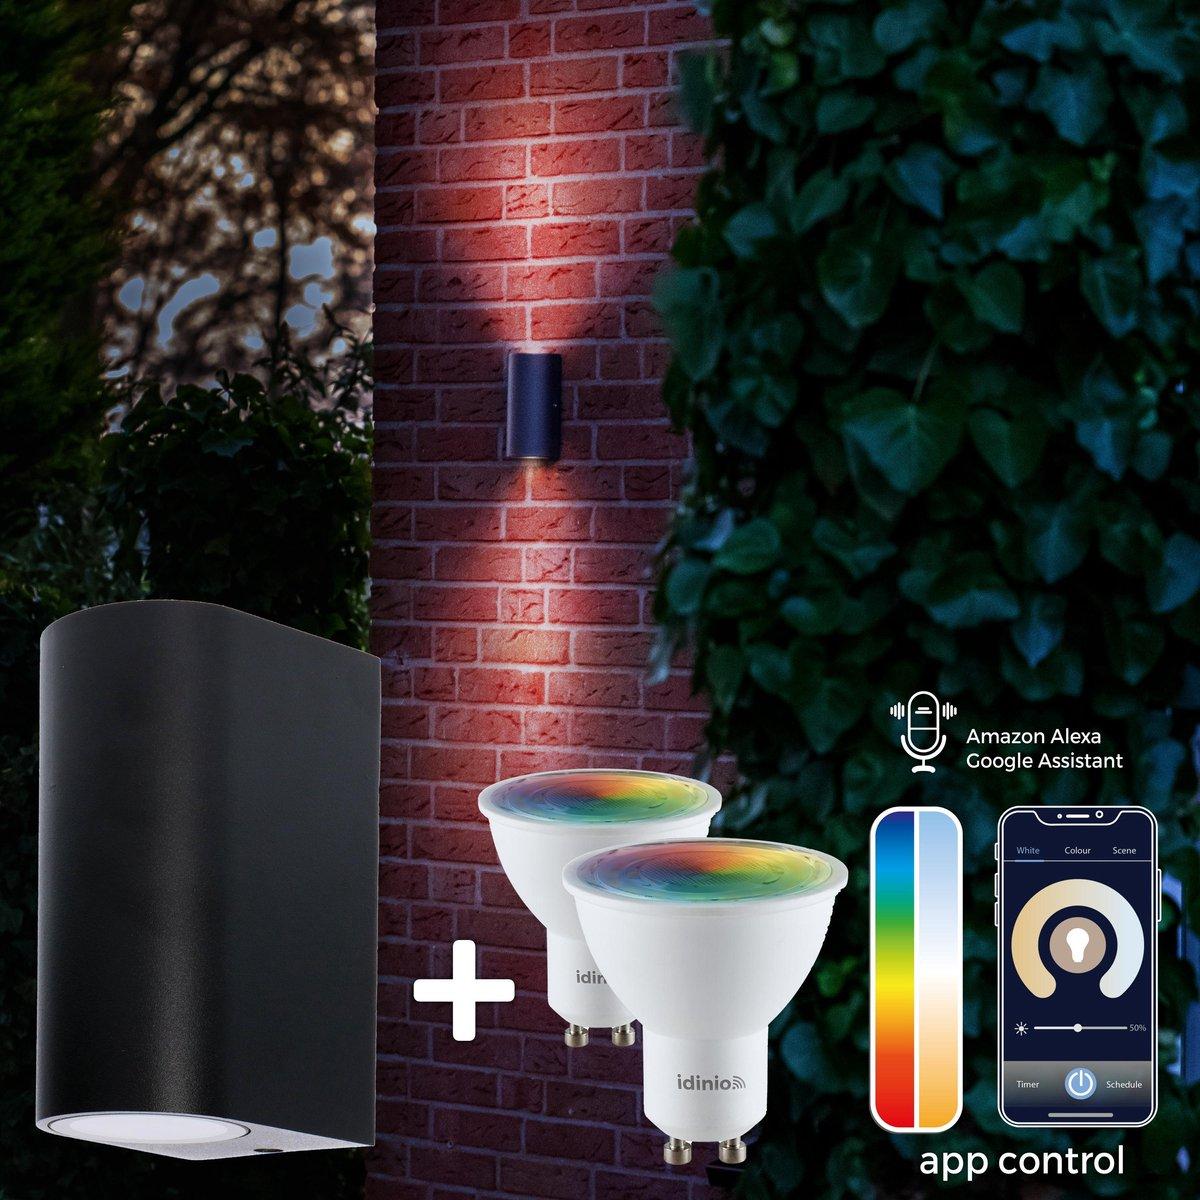 Proventa Slimme buitenlamp - Wandlamp Model E - White & Color - 1 x LED Muurlamp